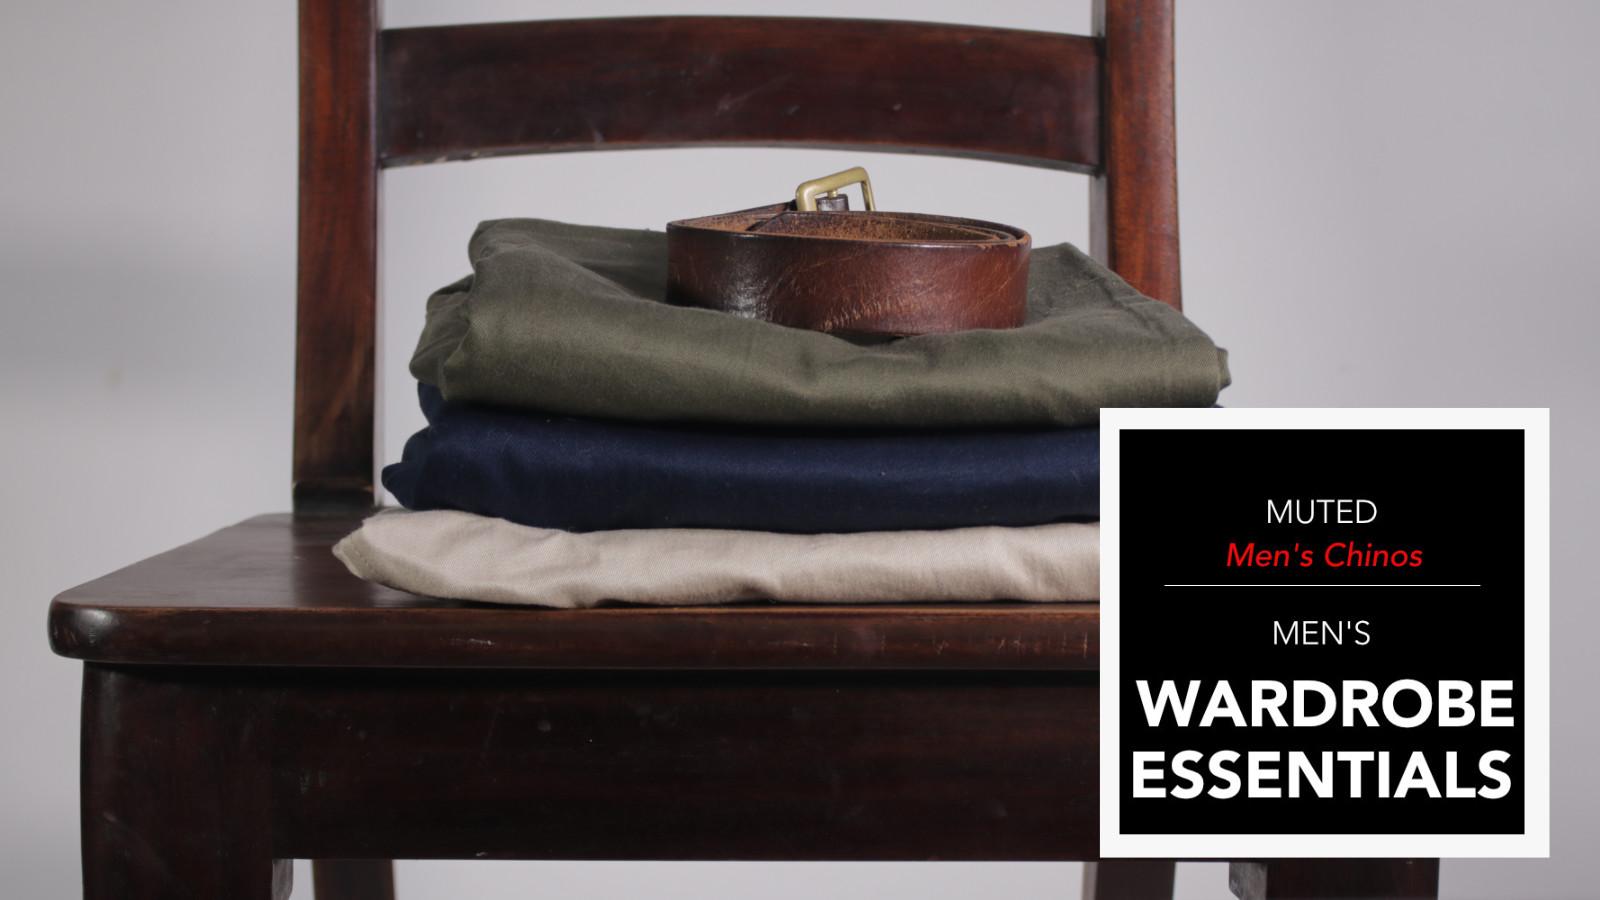 Men's Wardrobe Essentials – The Chino